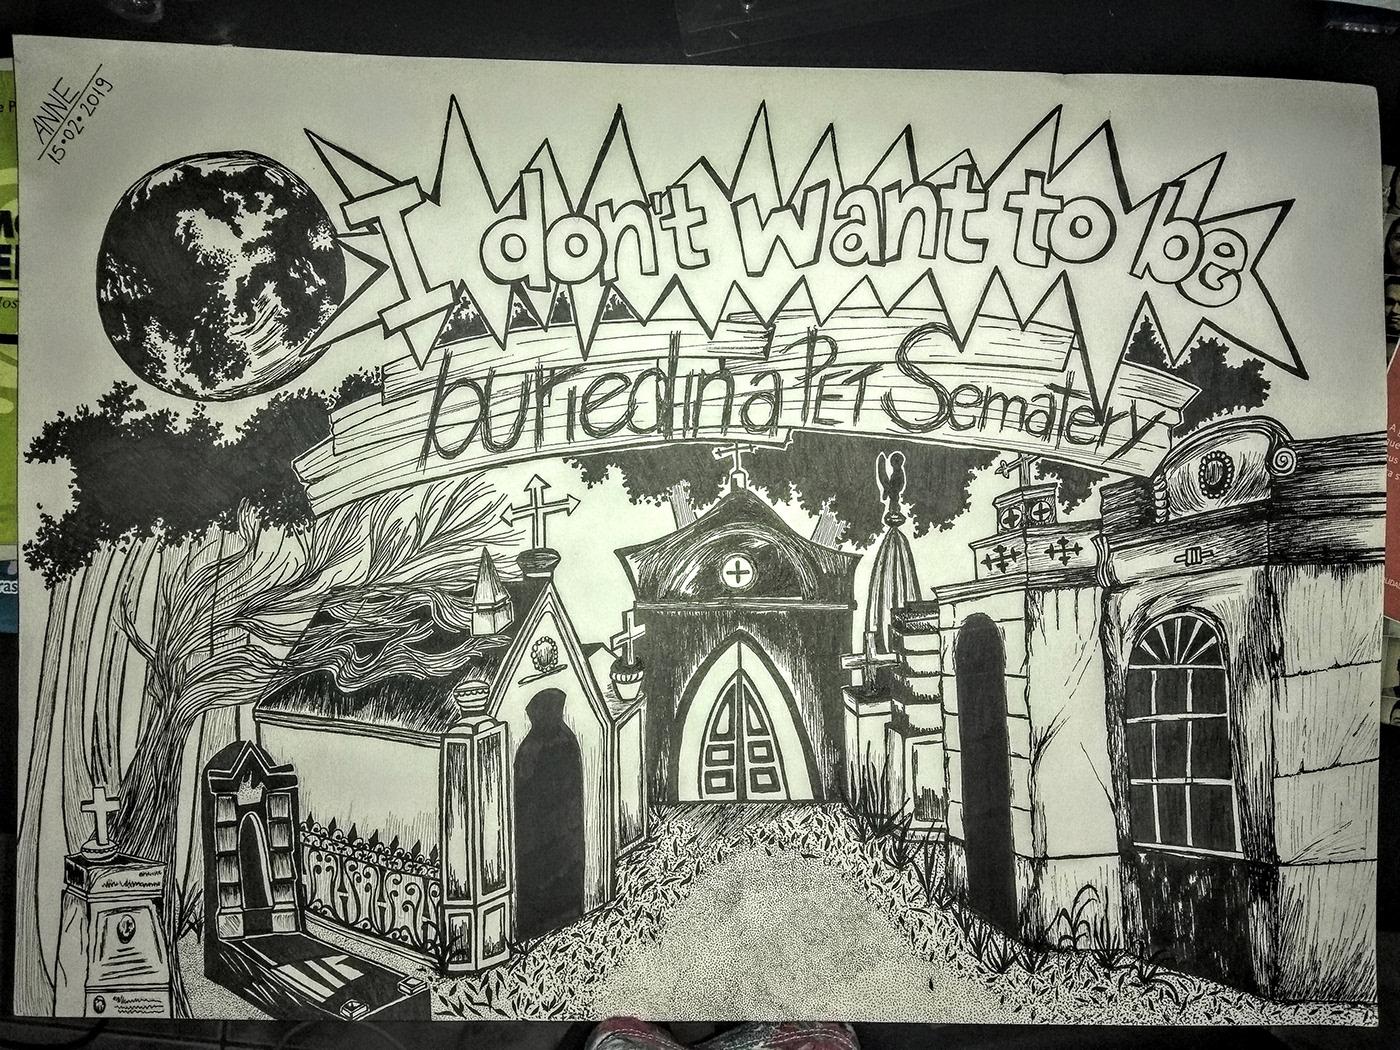 desenho preto&branco pet sematery filme cemitério maldito homenagemaosramones ramonestribute graphicartwork Ilustração annefreitas annefreitasdesign